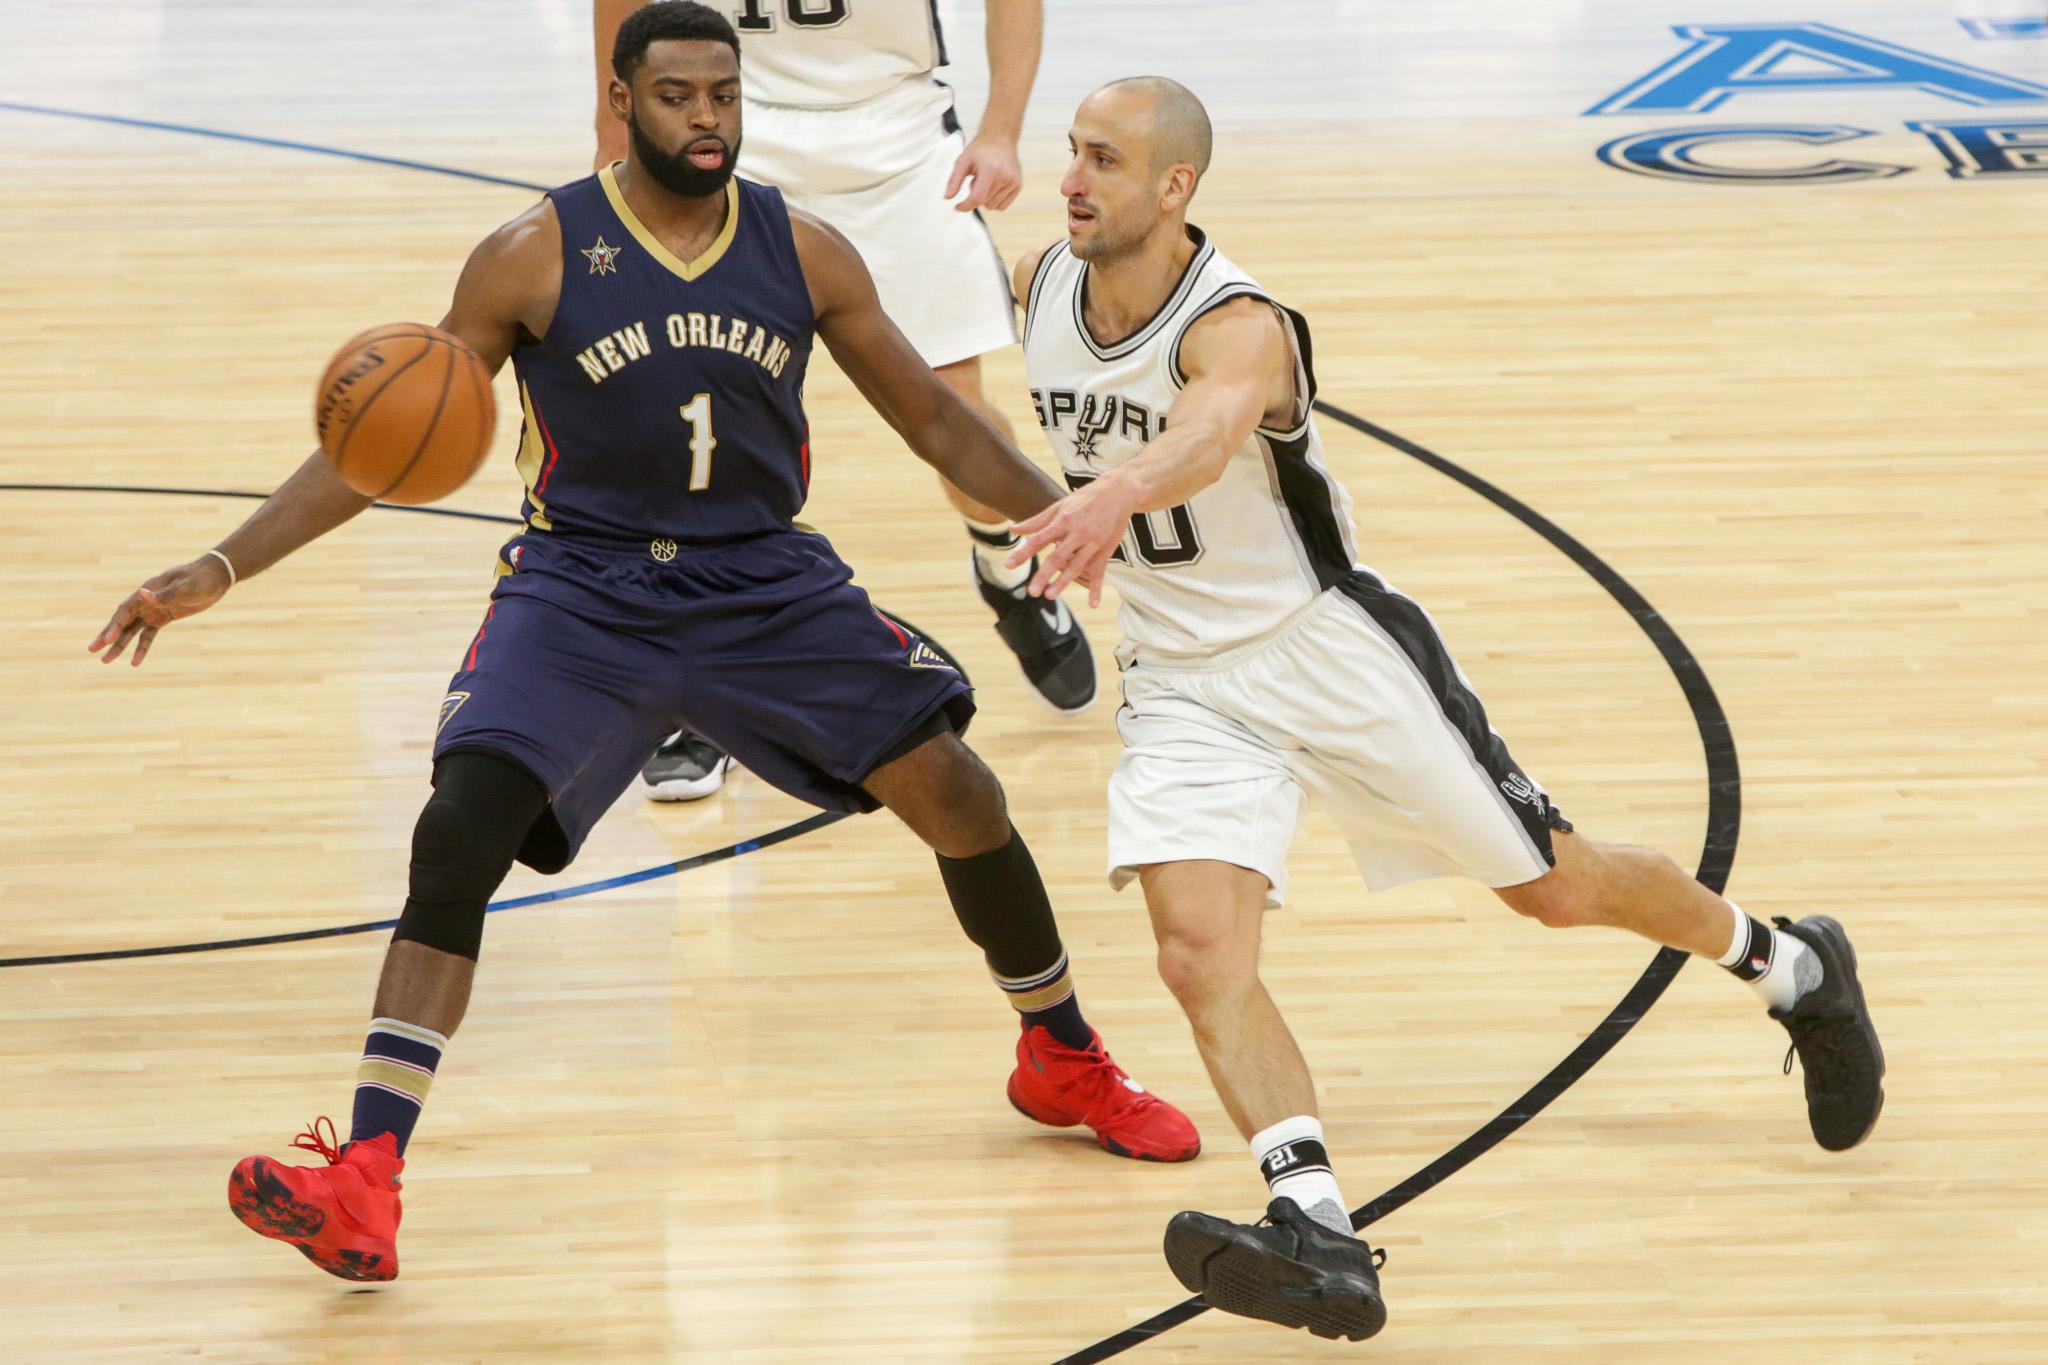 Spurs Guard #20 Manu Ginobili dishes the ball on the run.